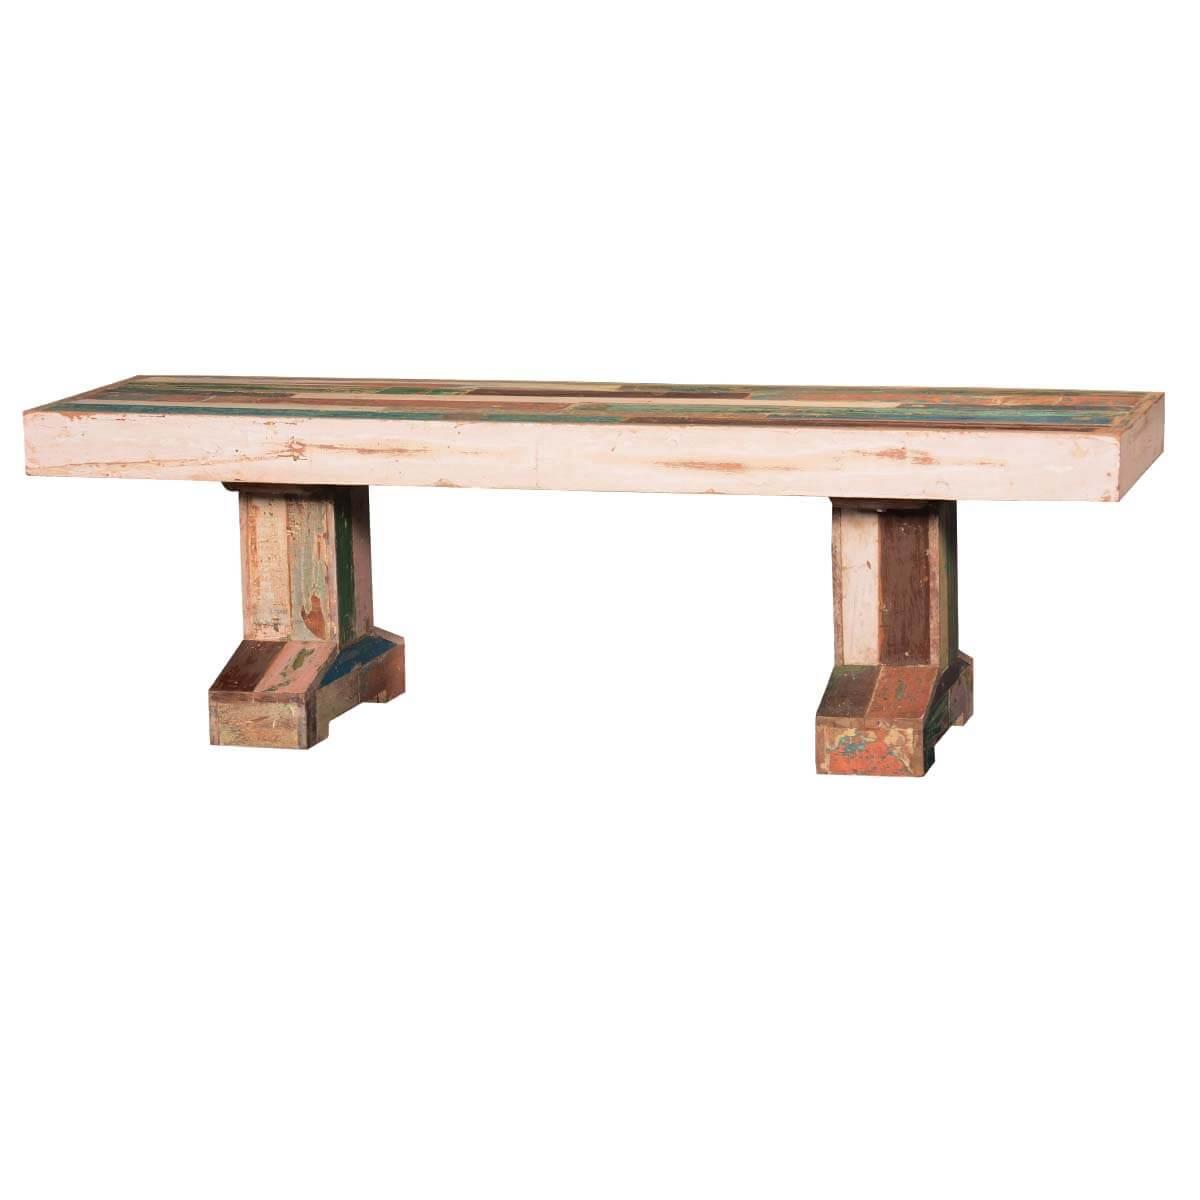 Etolin Reclaimed Wood Double Pedestal Bench